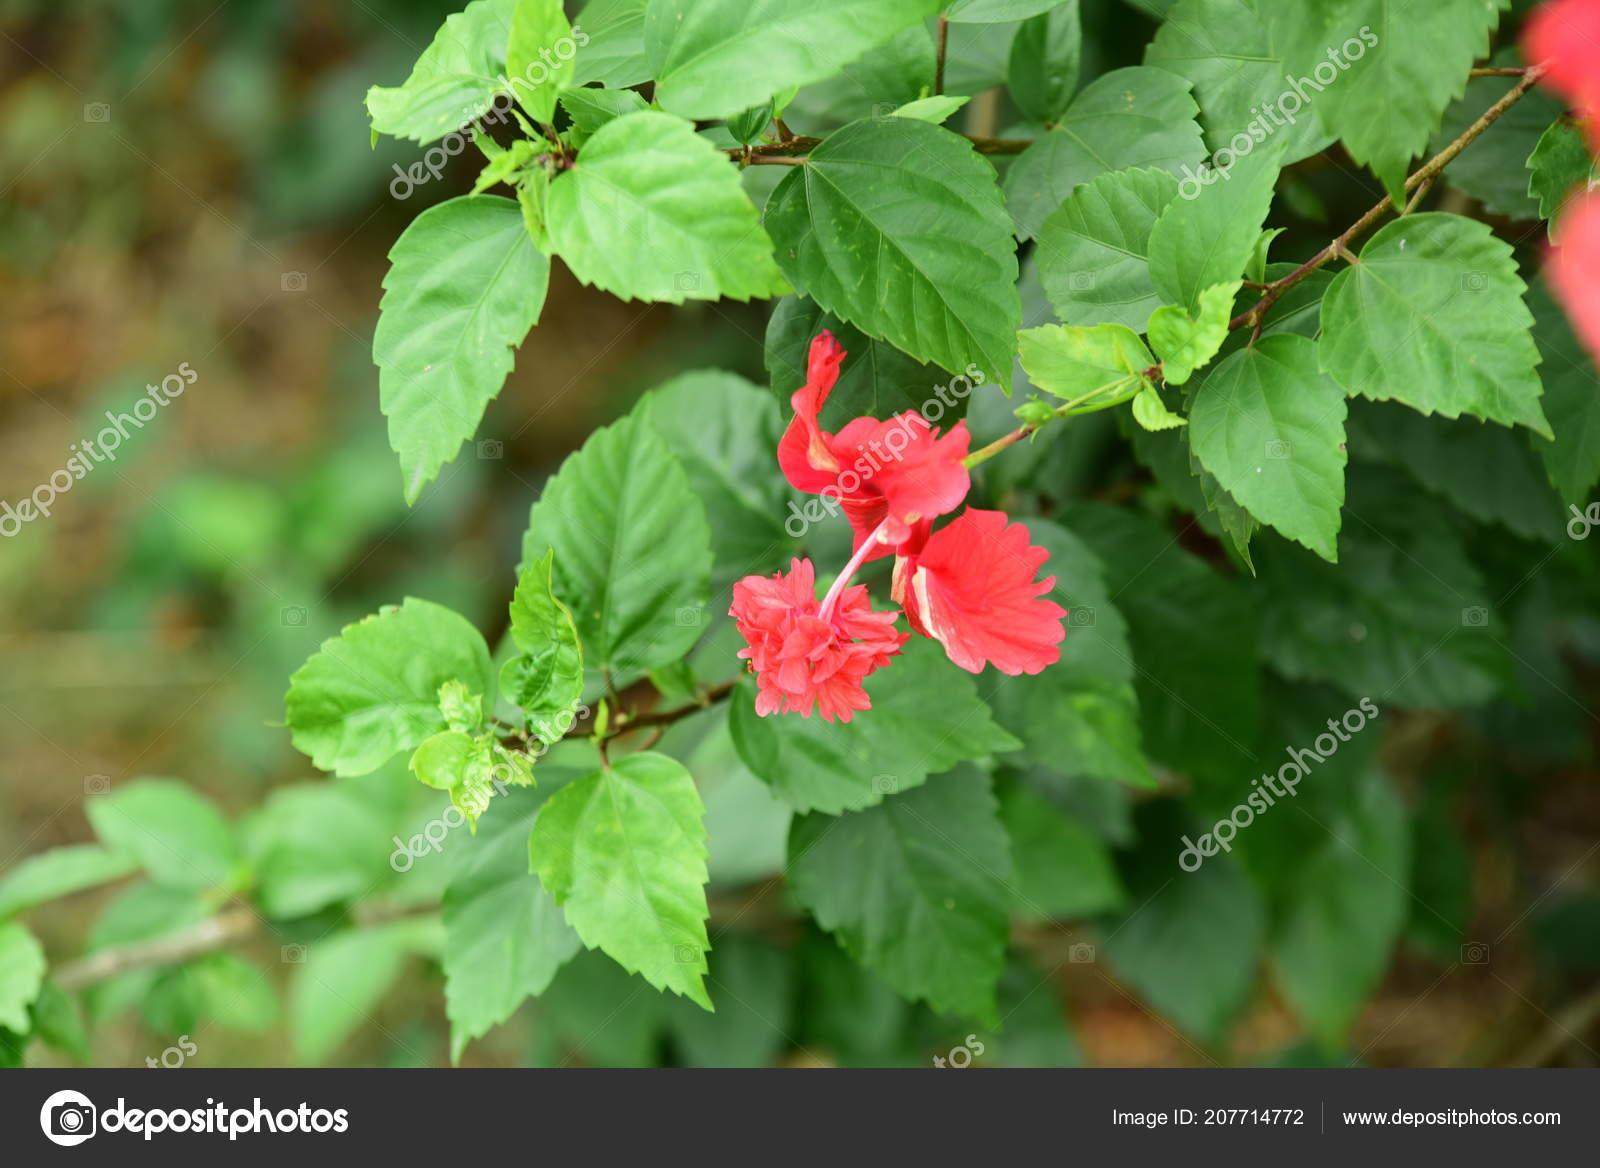 Beautiful Flowers Garden Blooming Summer Landscaped Formal Garden